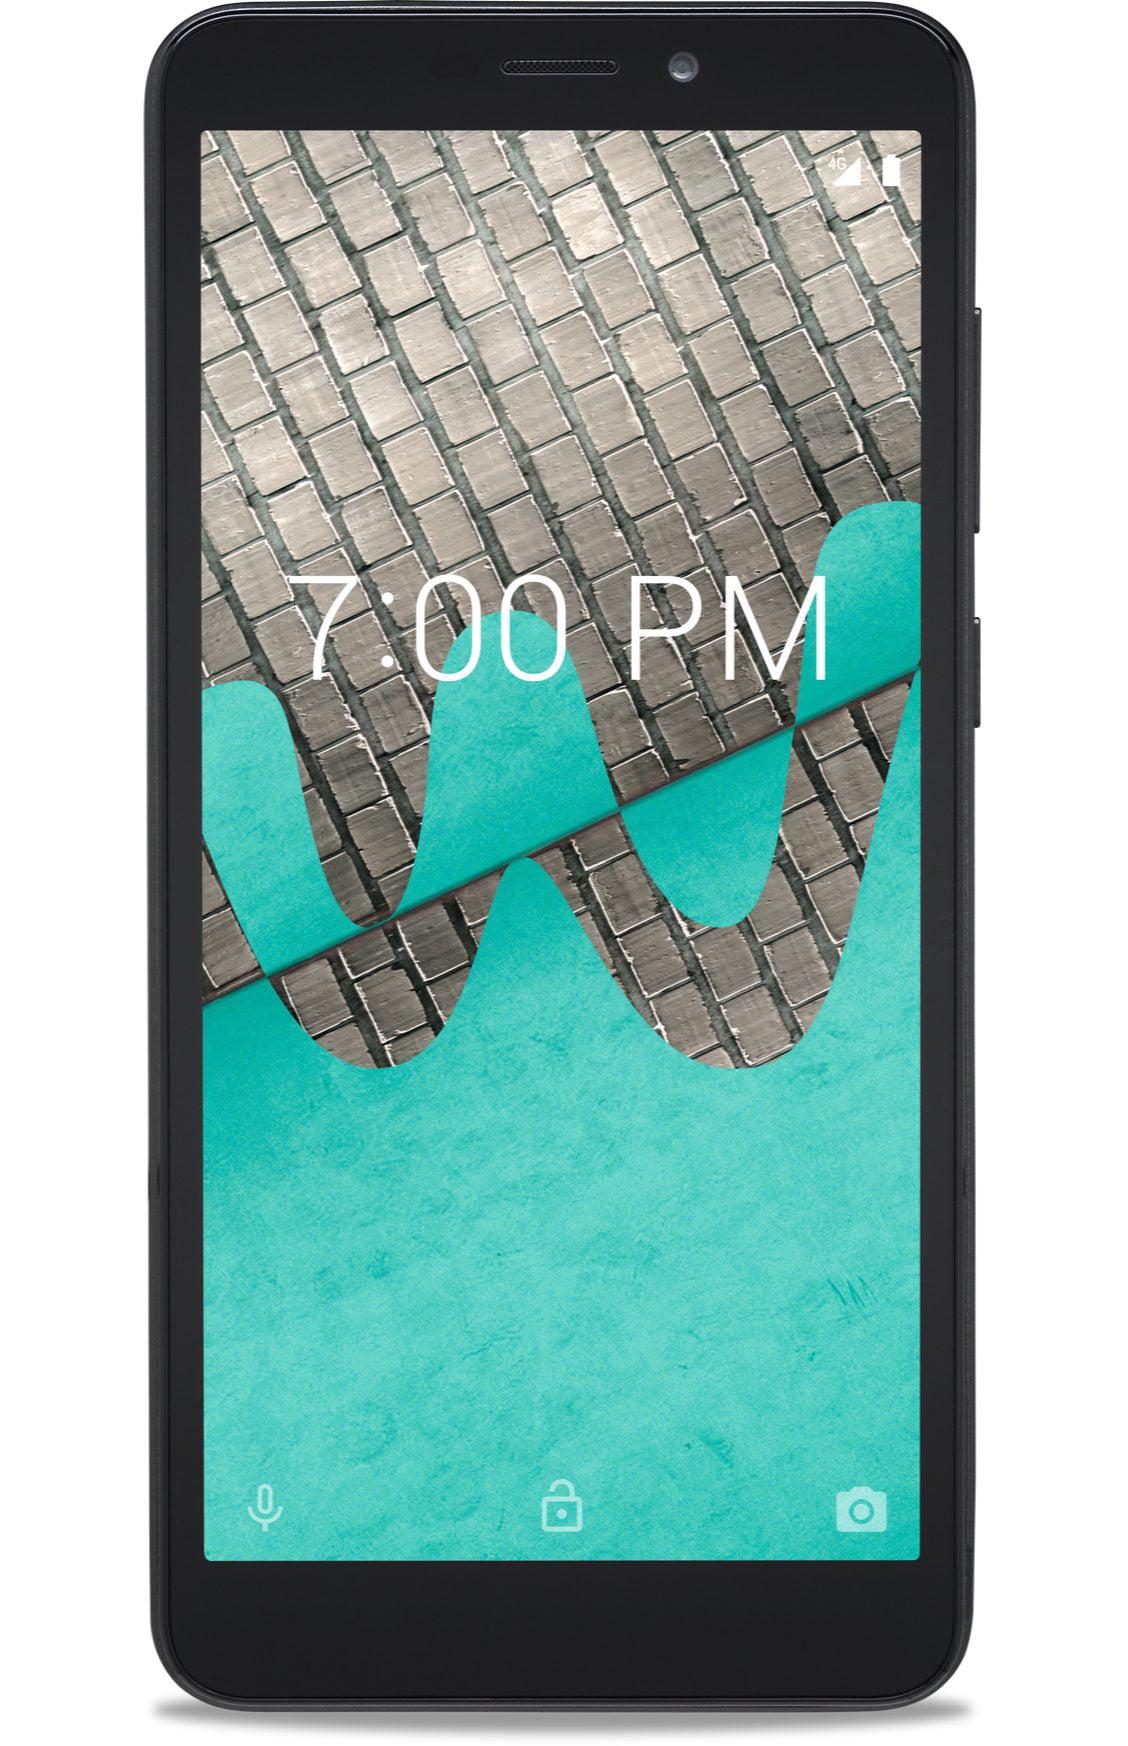 Boost Mobile ANS Wiko Ride 16 GB Prepaid Smartphone, Black